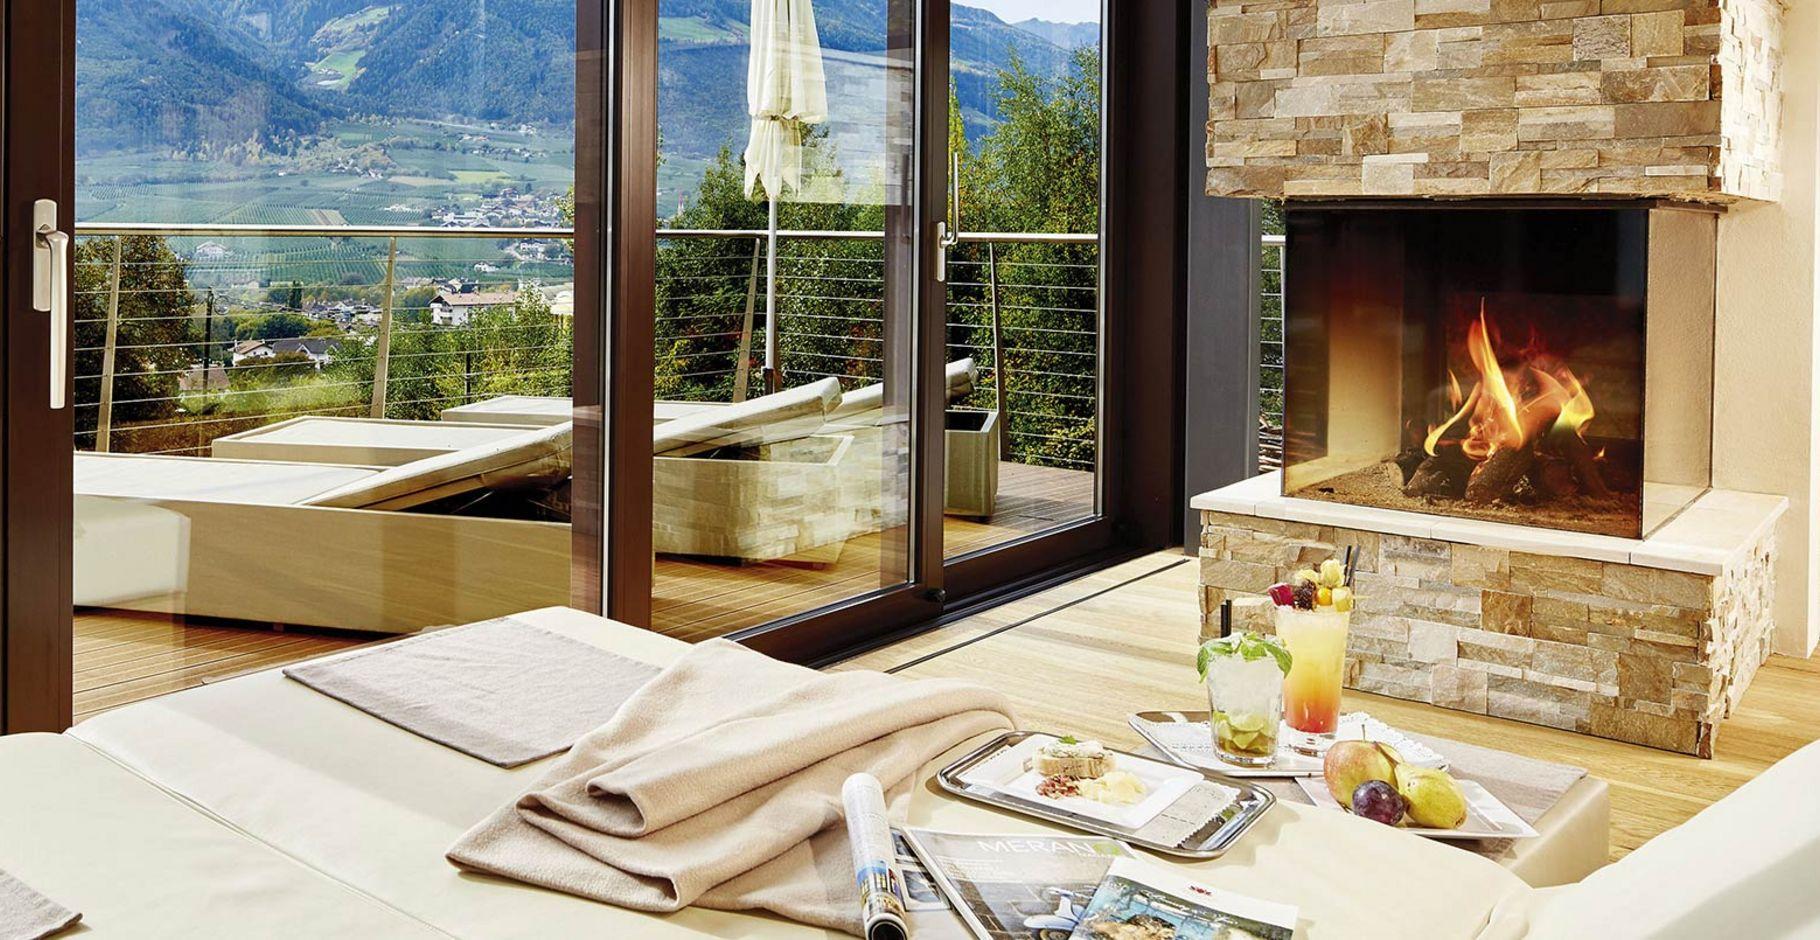 Luxury DolceVita Spa Resort Preidlhof